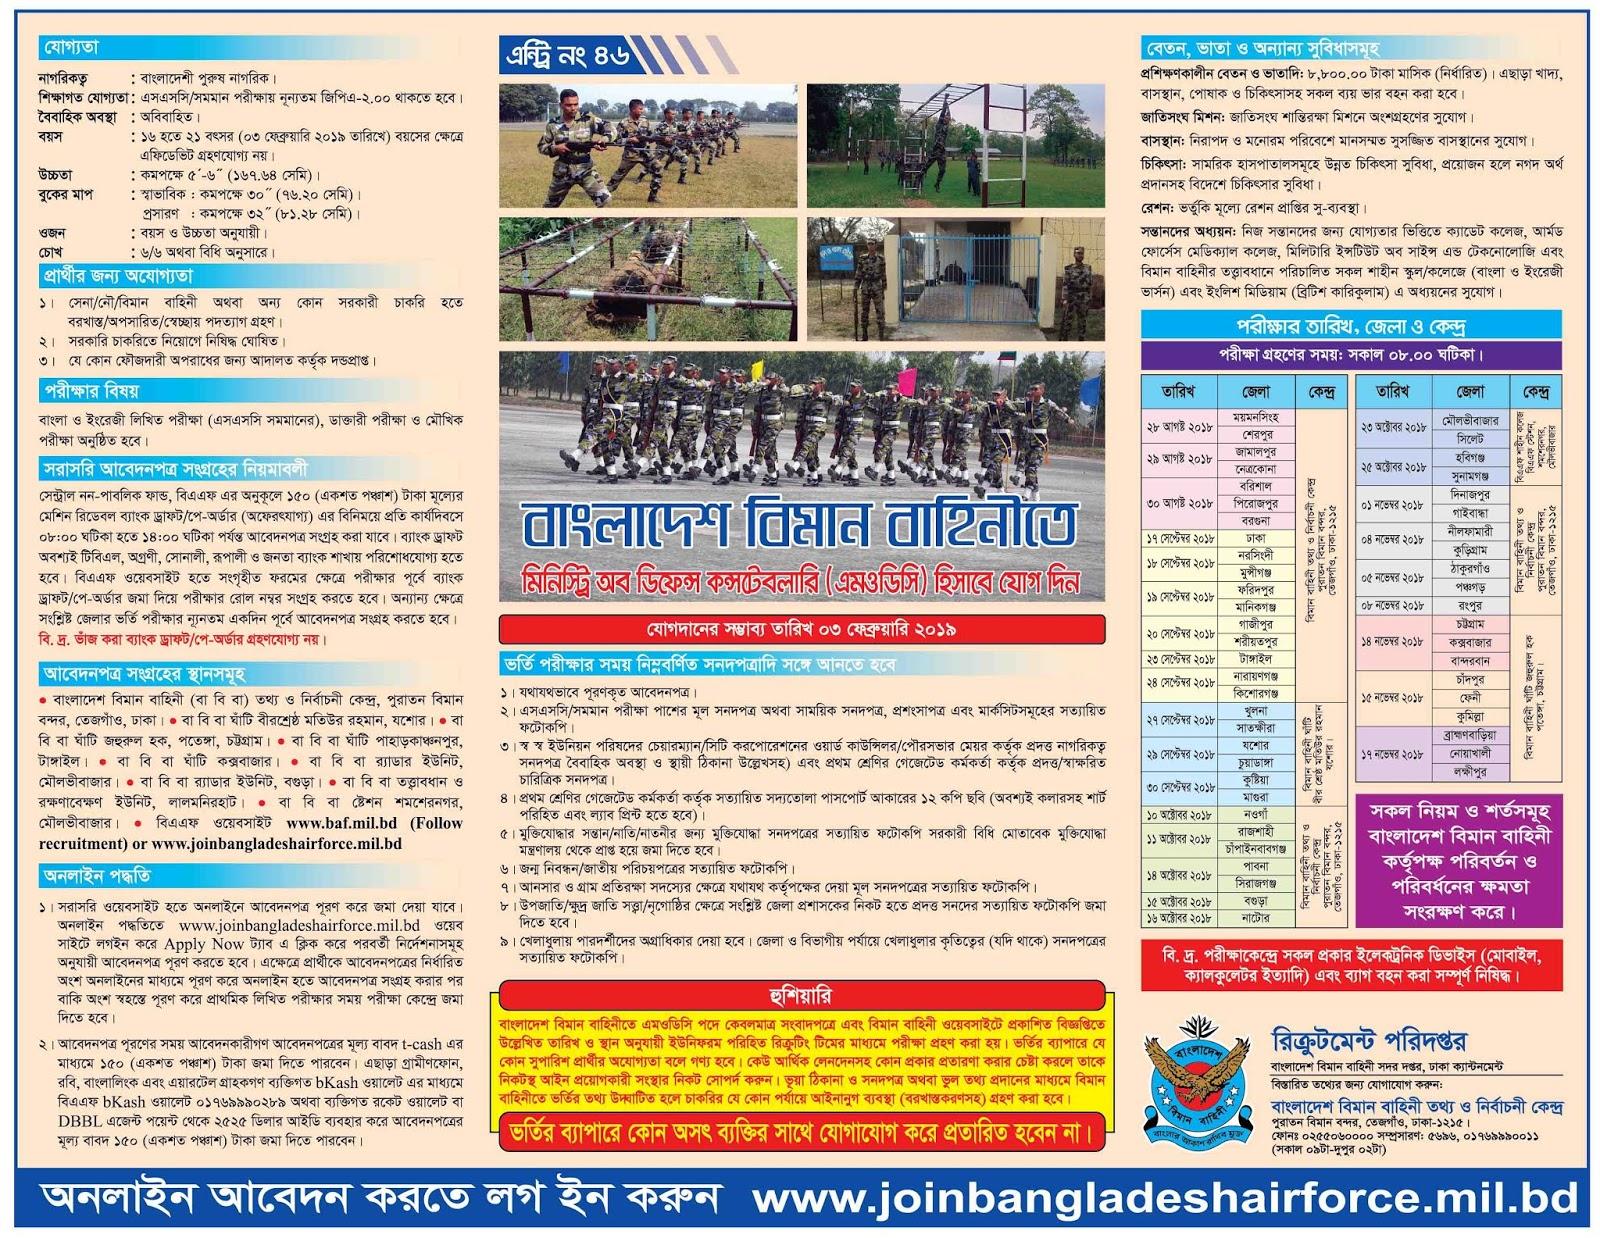 Bangladesh Air Force MODC Recruitment Circular 2018